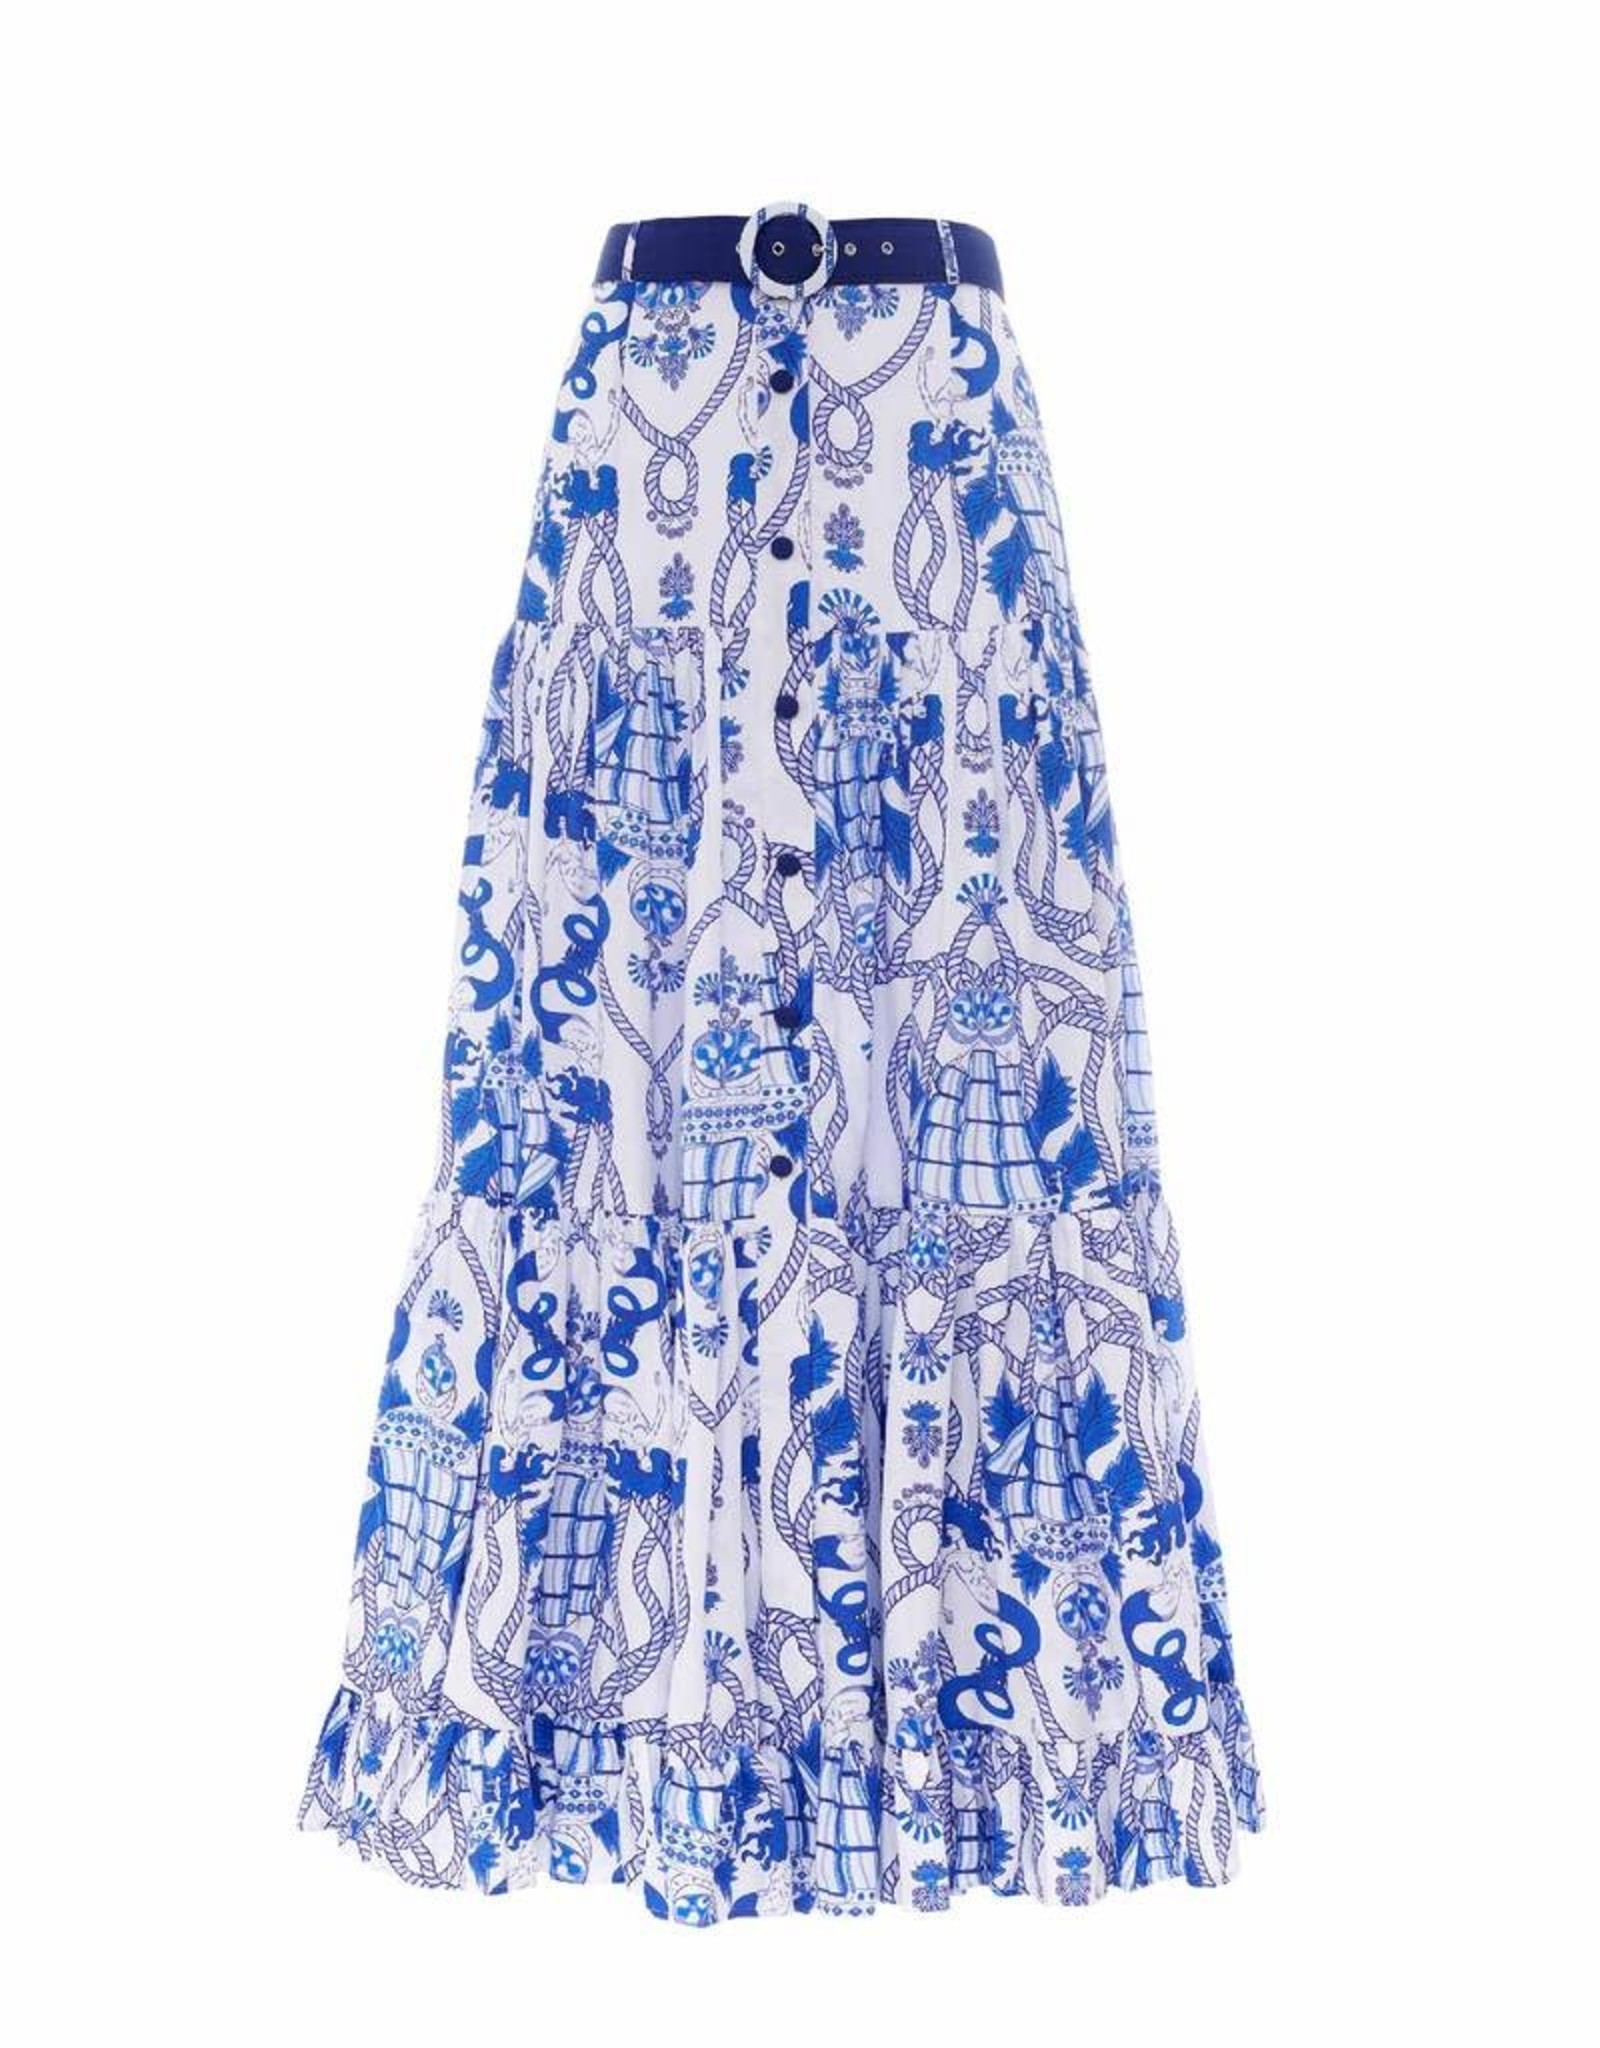 Paolita Cleo Button Maxi Skirt SMALL